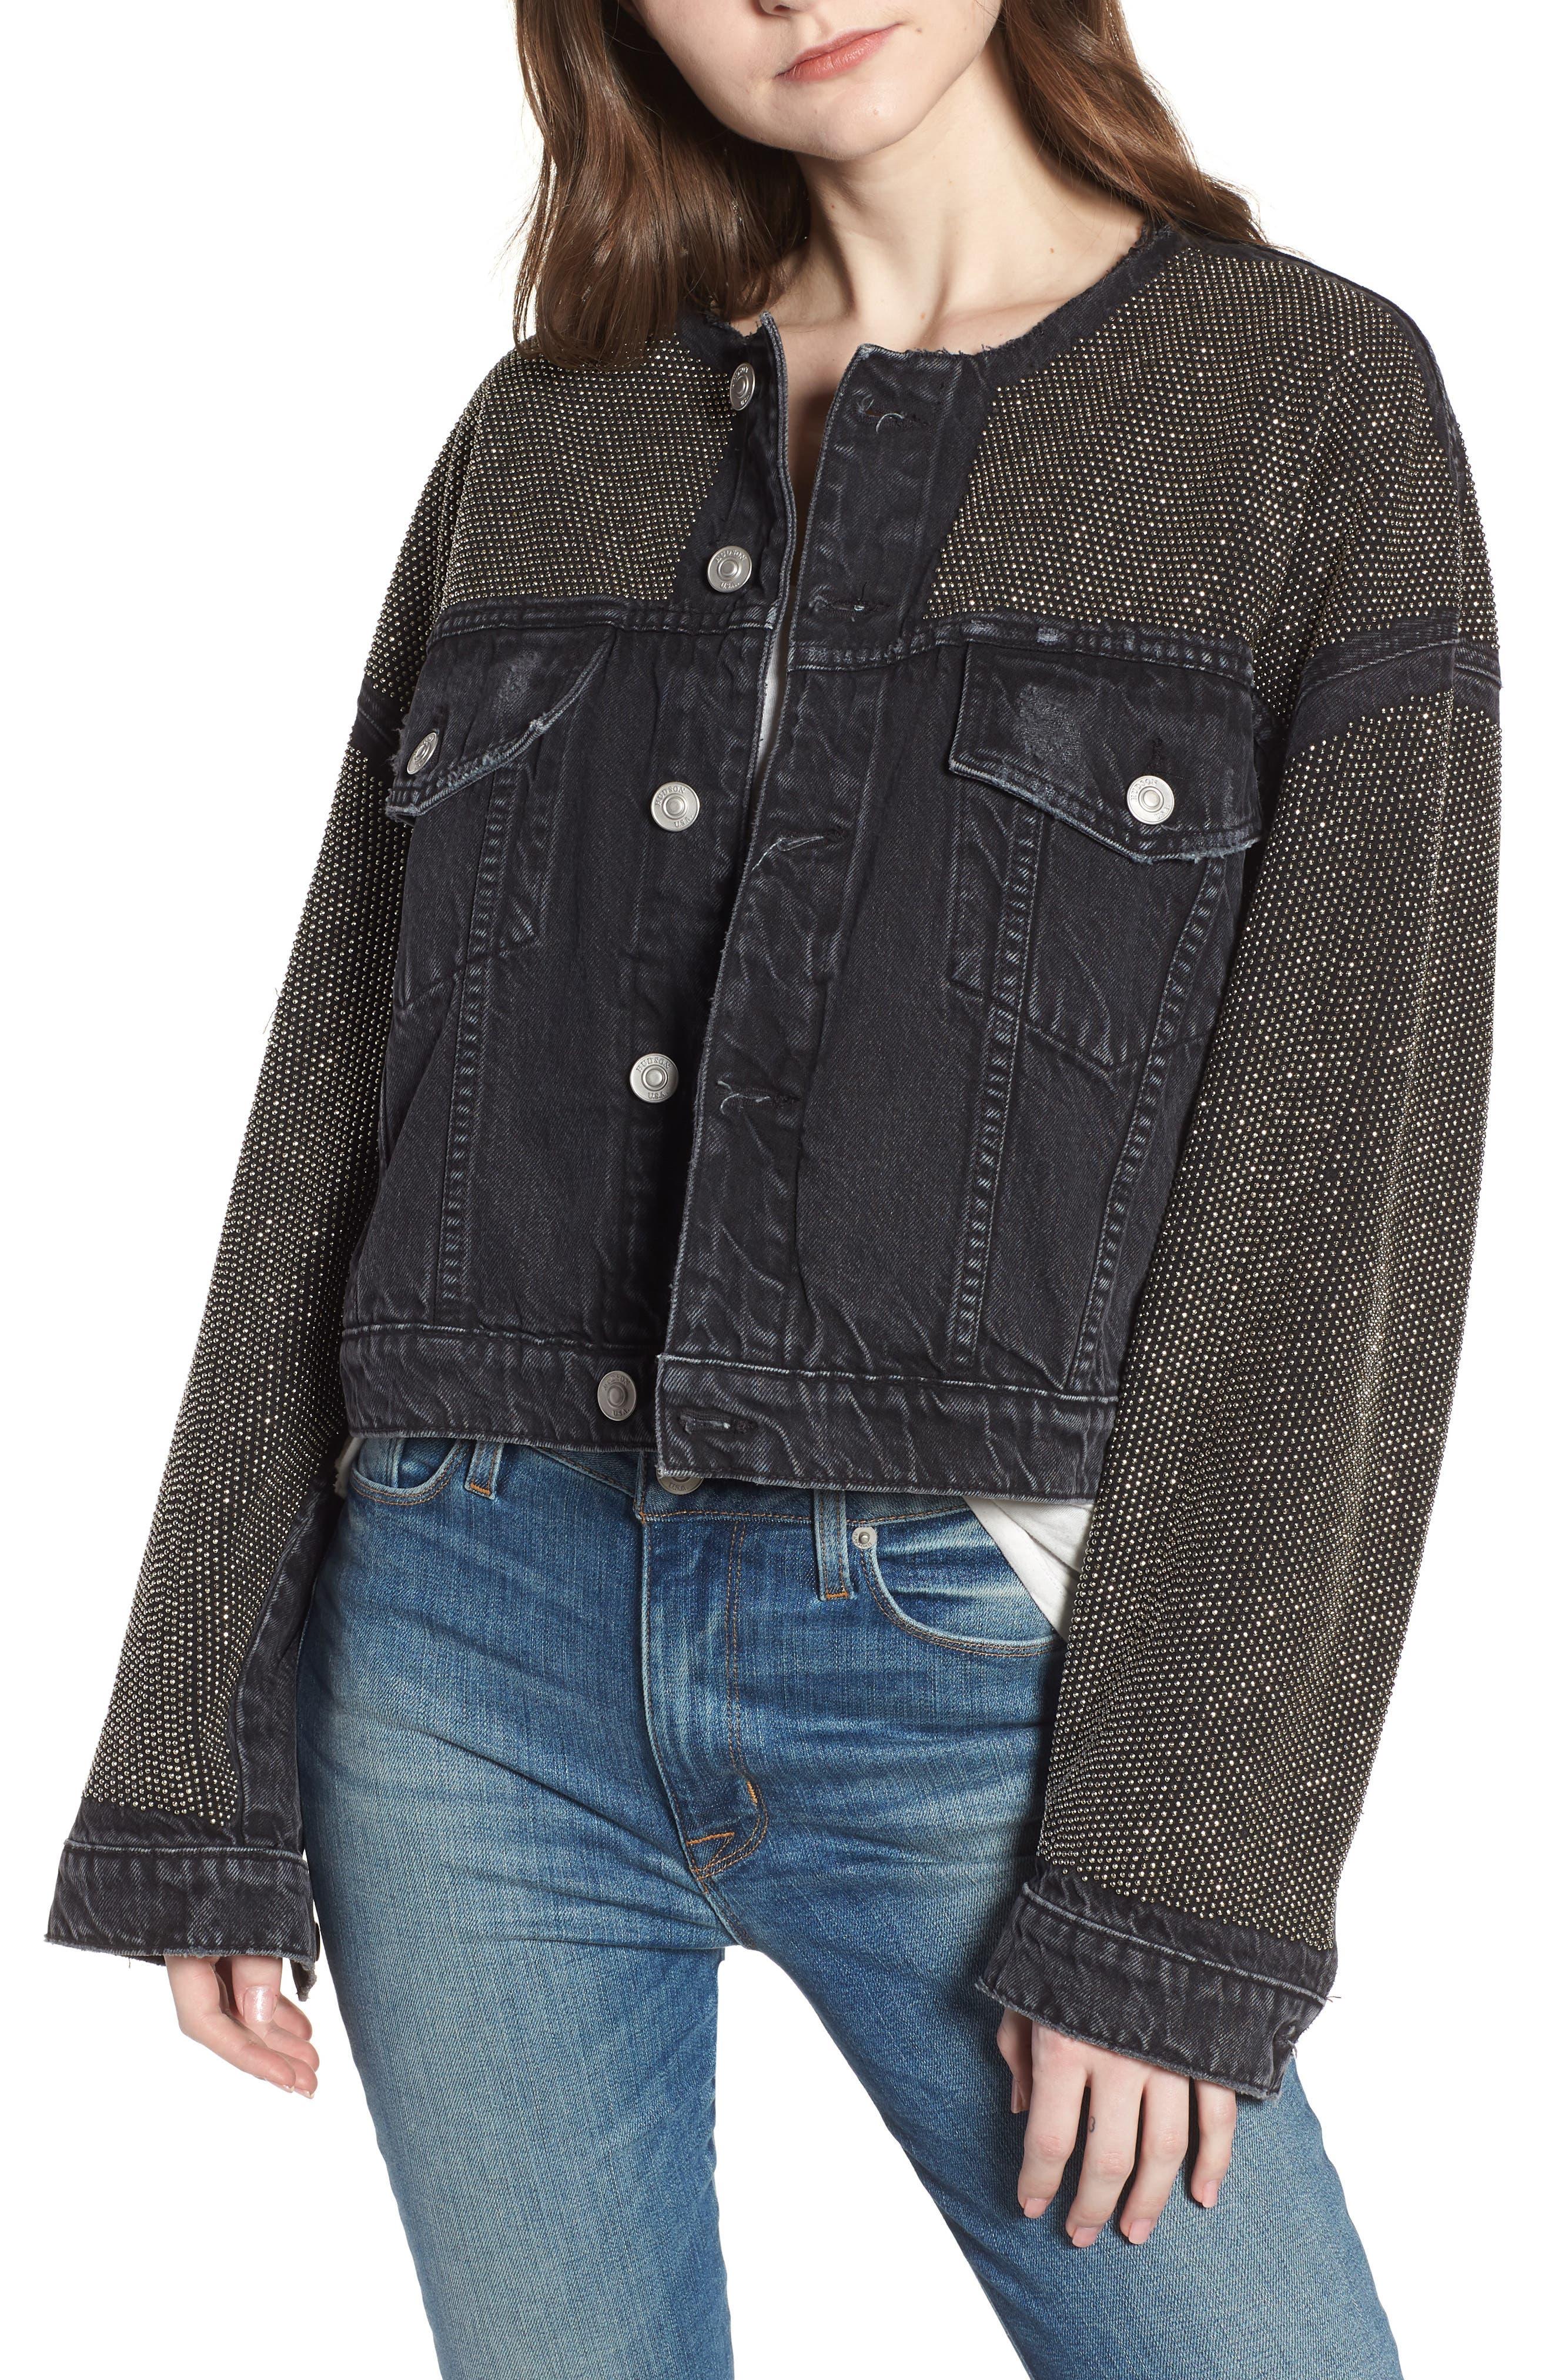 Rei Studded Crop Denim Jacket,                             Main thumbnail 1, color,                             Bullet Proof